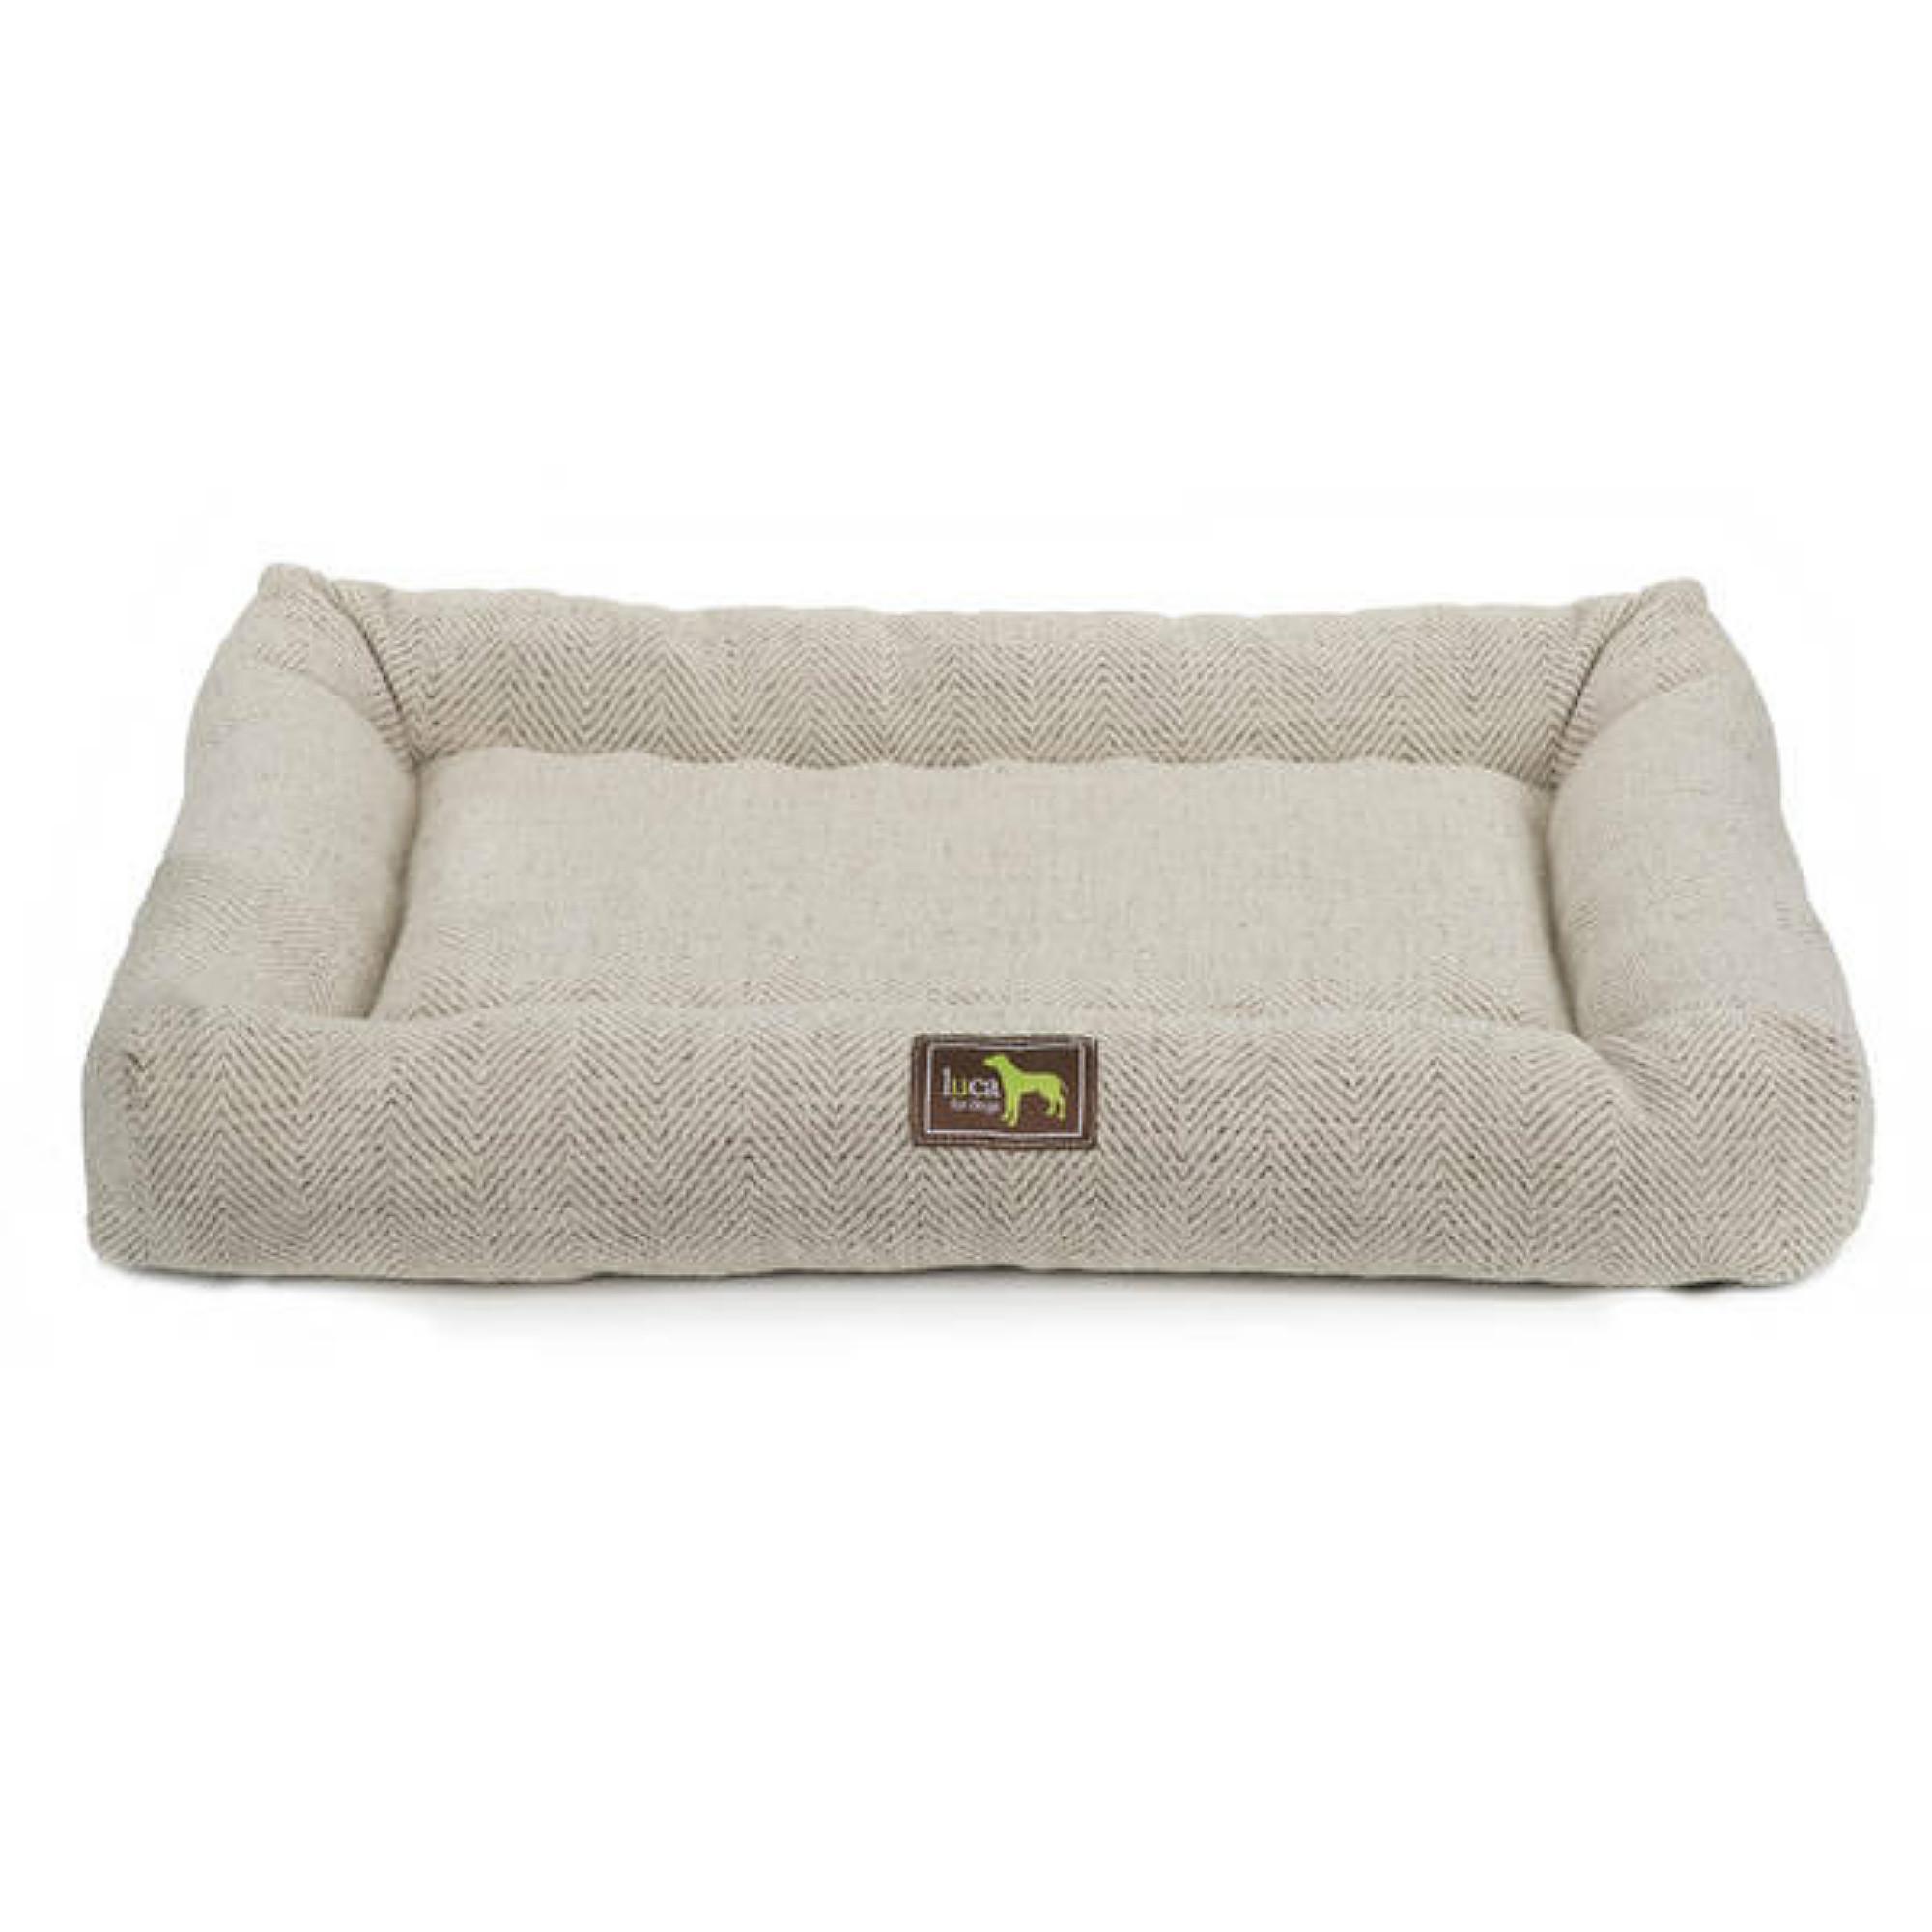 Luca Crate Cuddler Dog Bed - Oyster Tweed